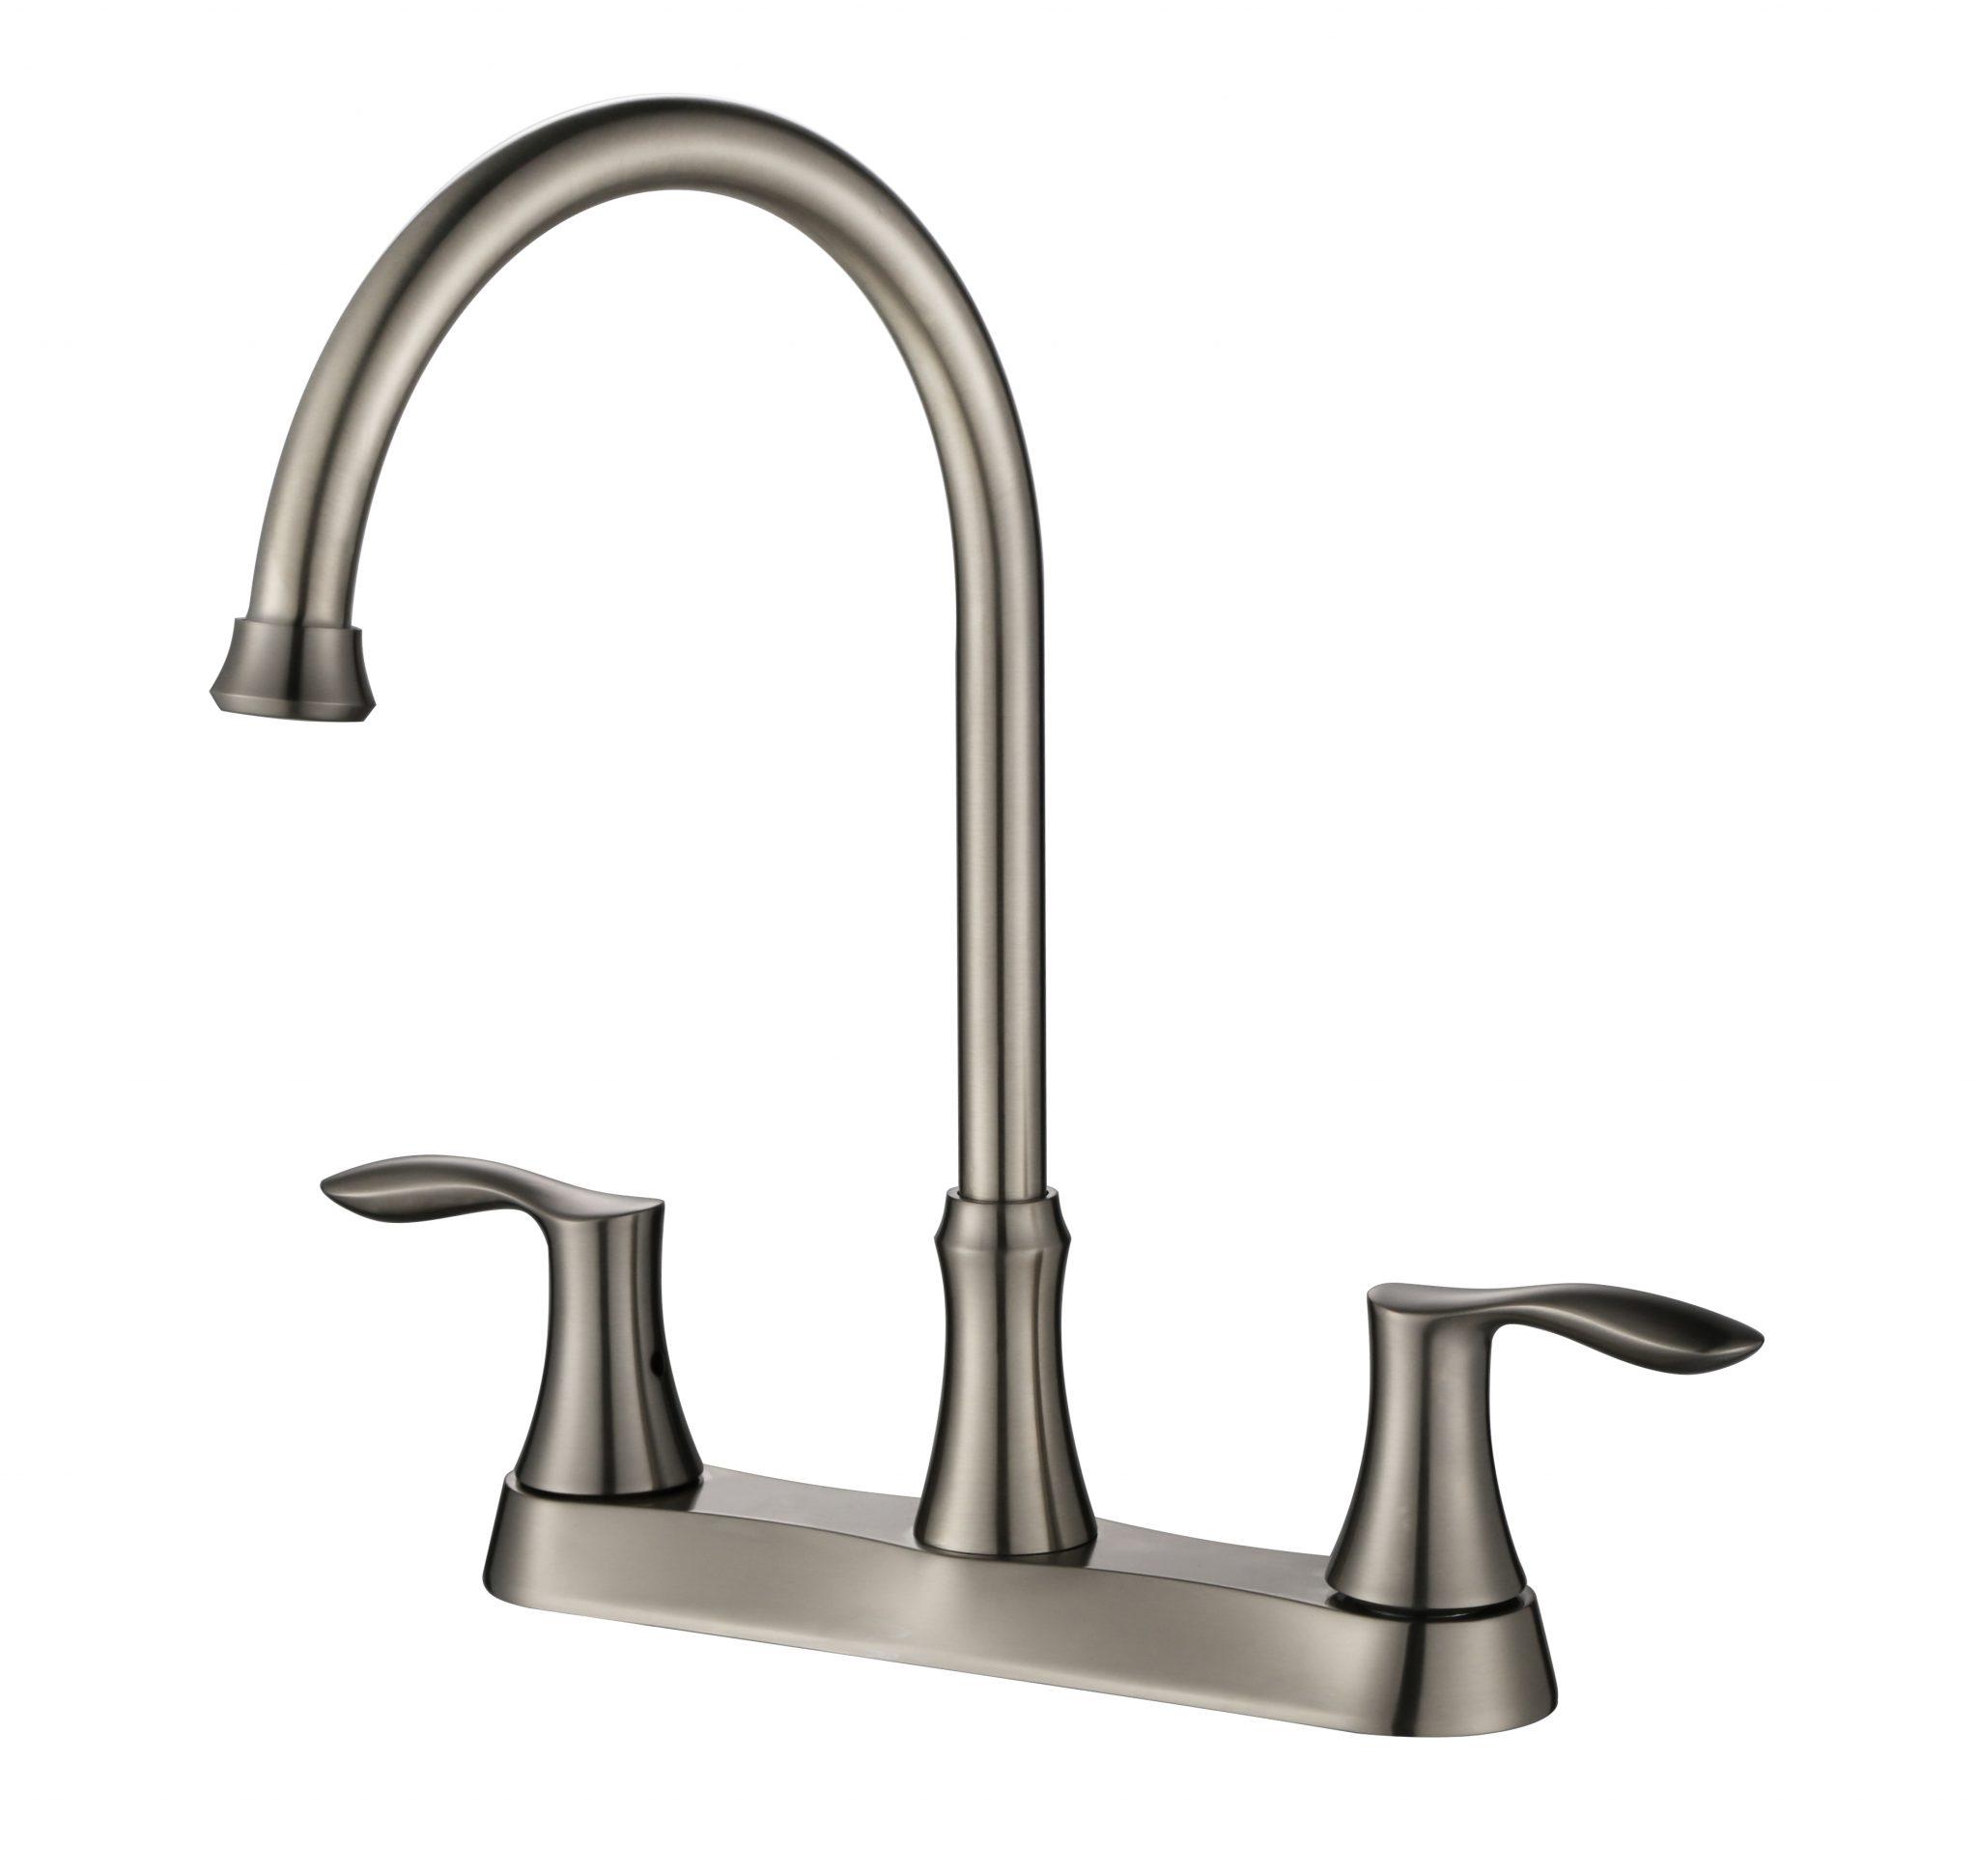 8u2033Centerset Two Handle Kitchen Faucet  KSK8238BN